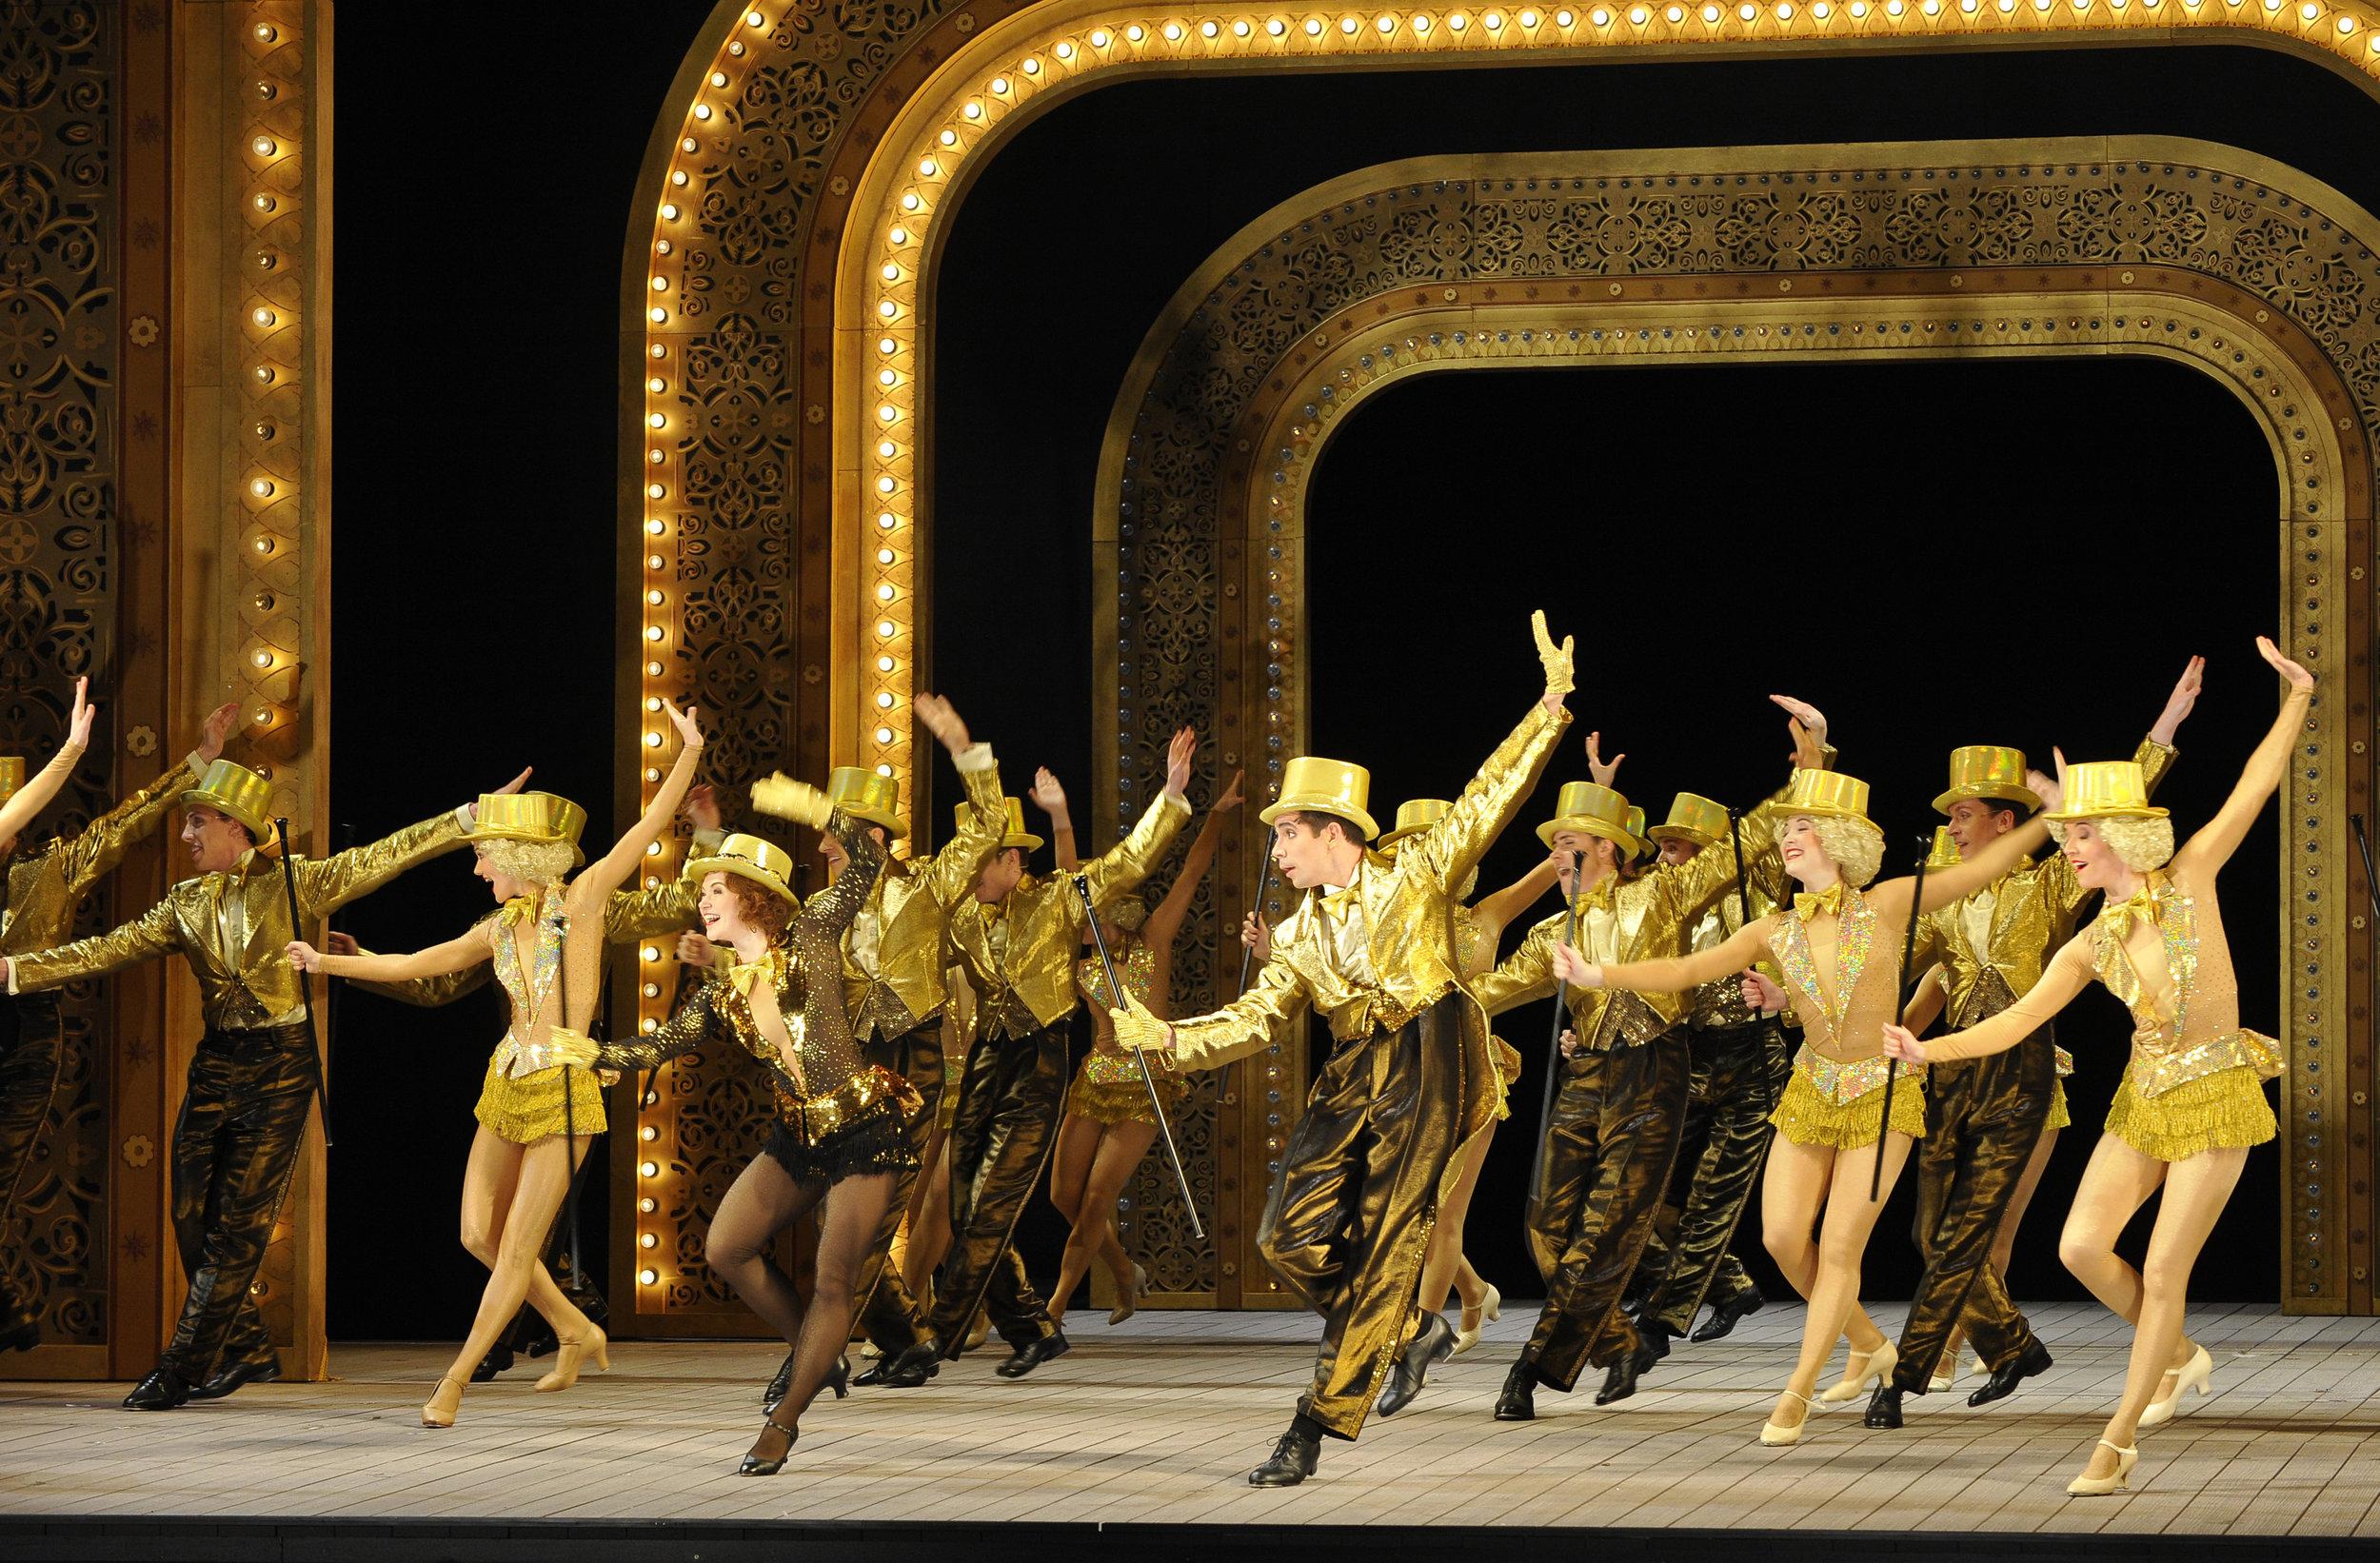 Broadway Melody